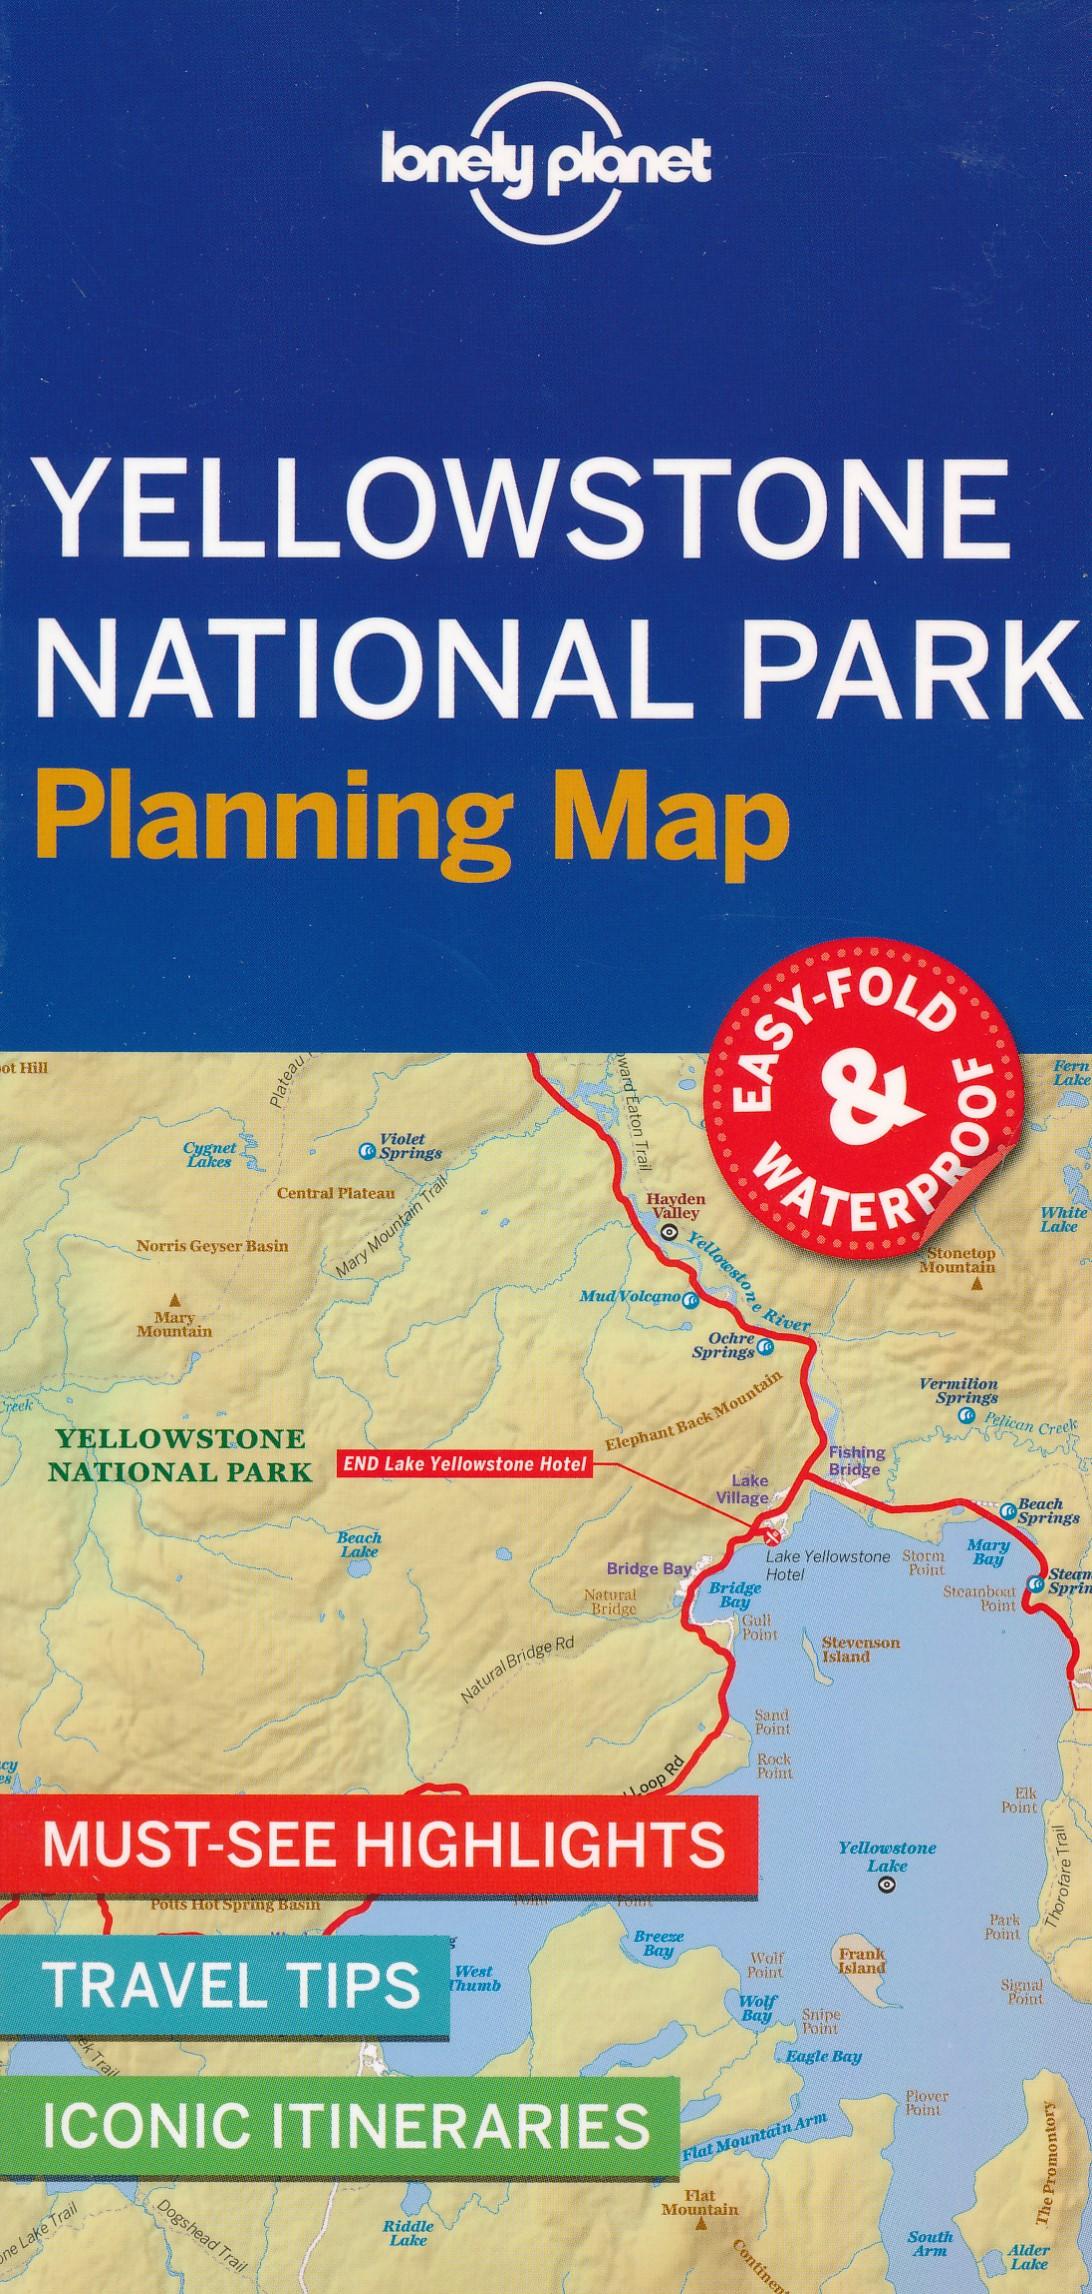 Wegenkaart - landkaart Planning Map Yellowstone National Park | Lonely Planet